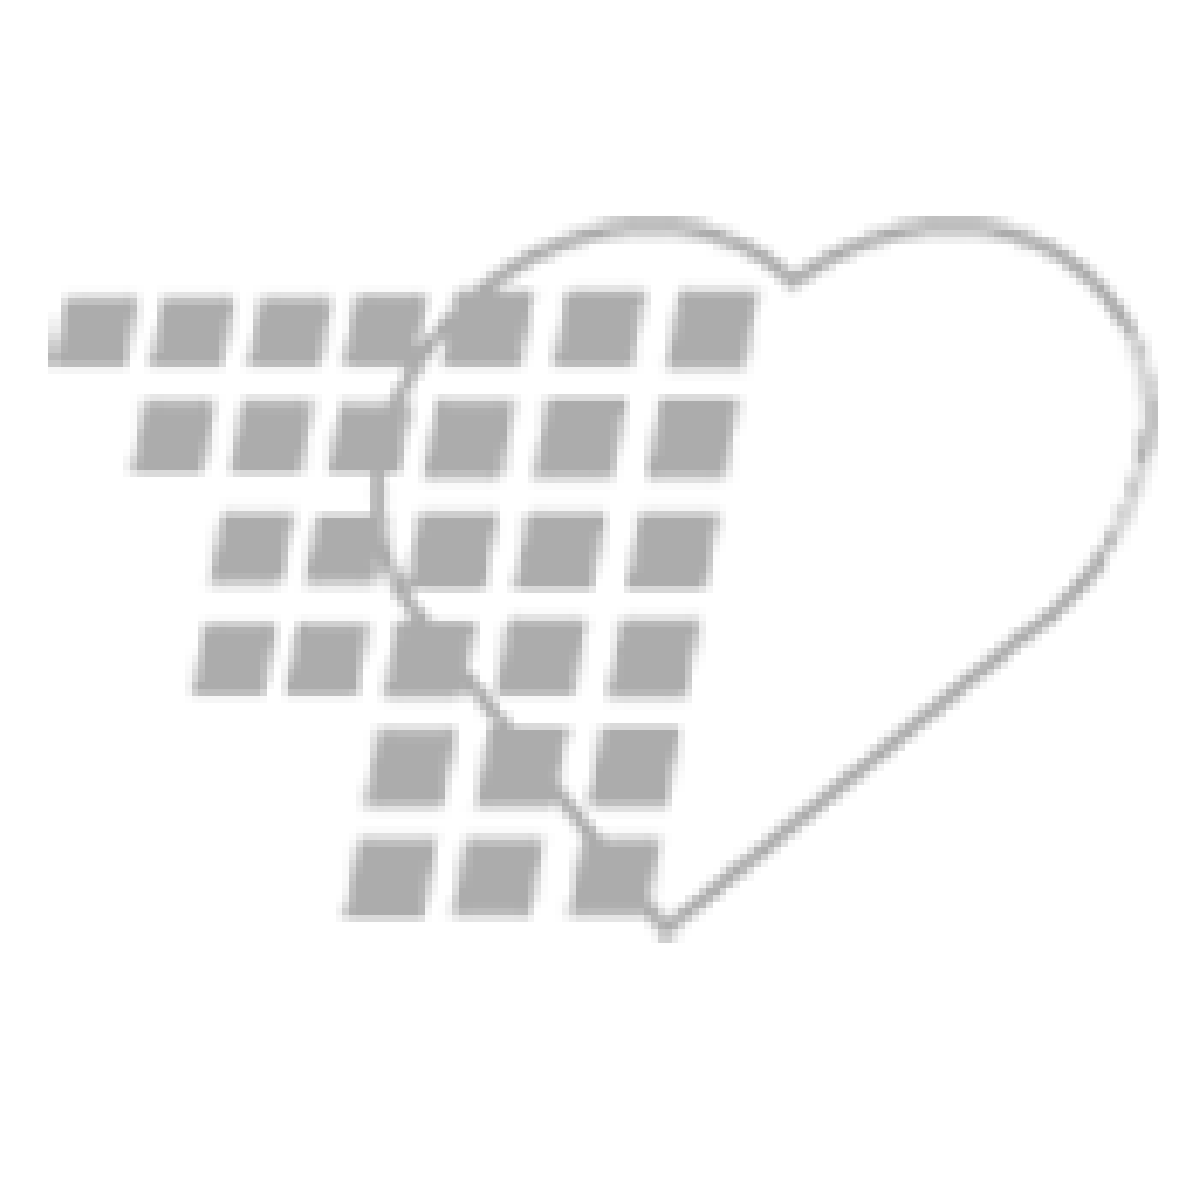 11-81-0690 Life/form® Episiotomy Suturing Simulators